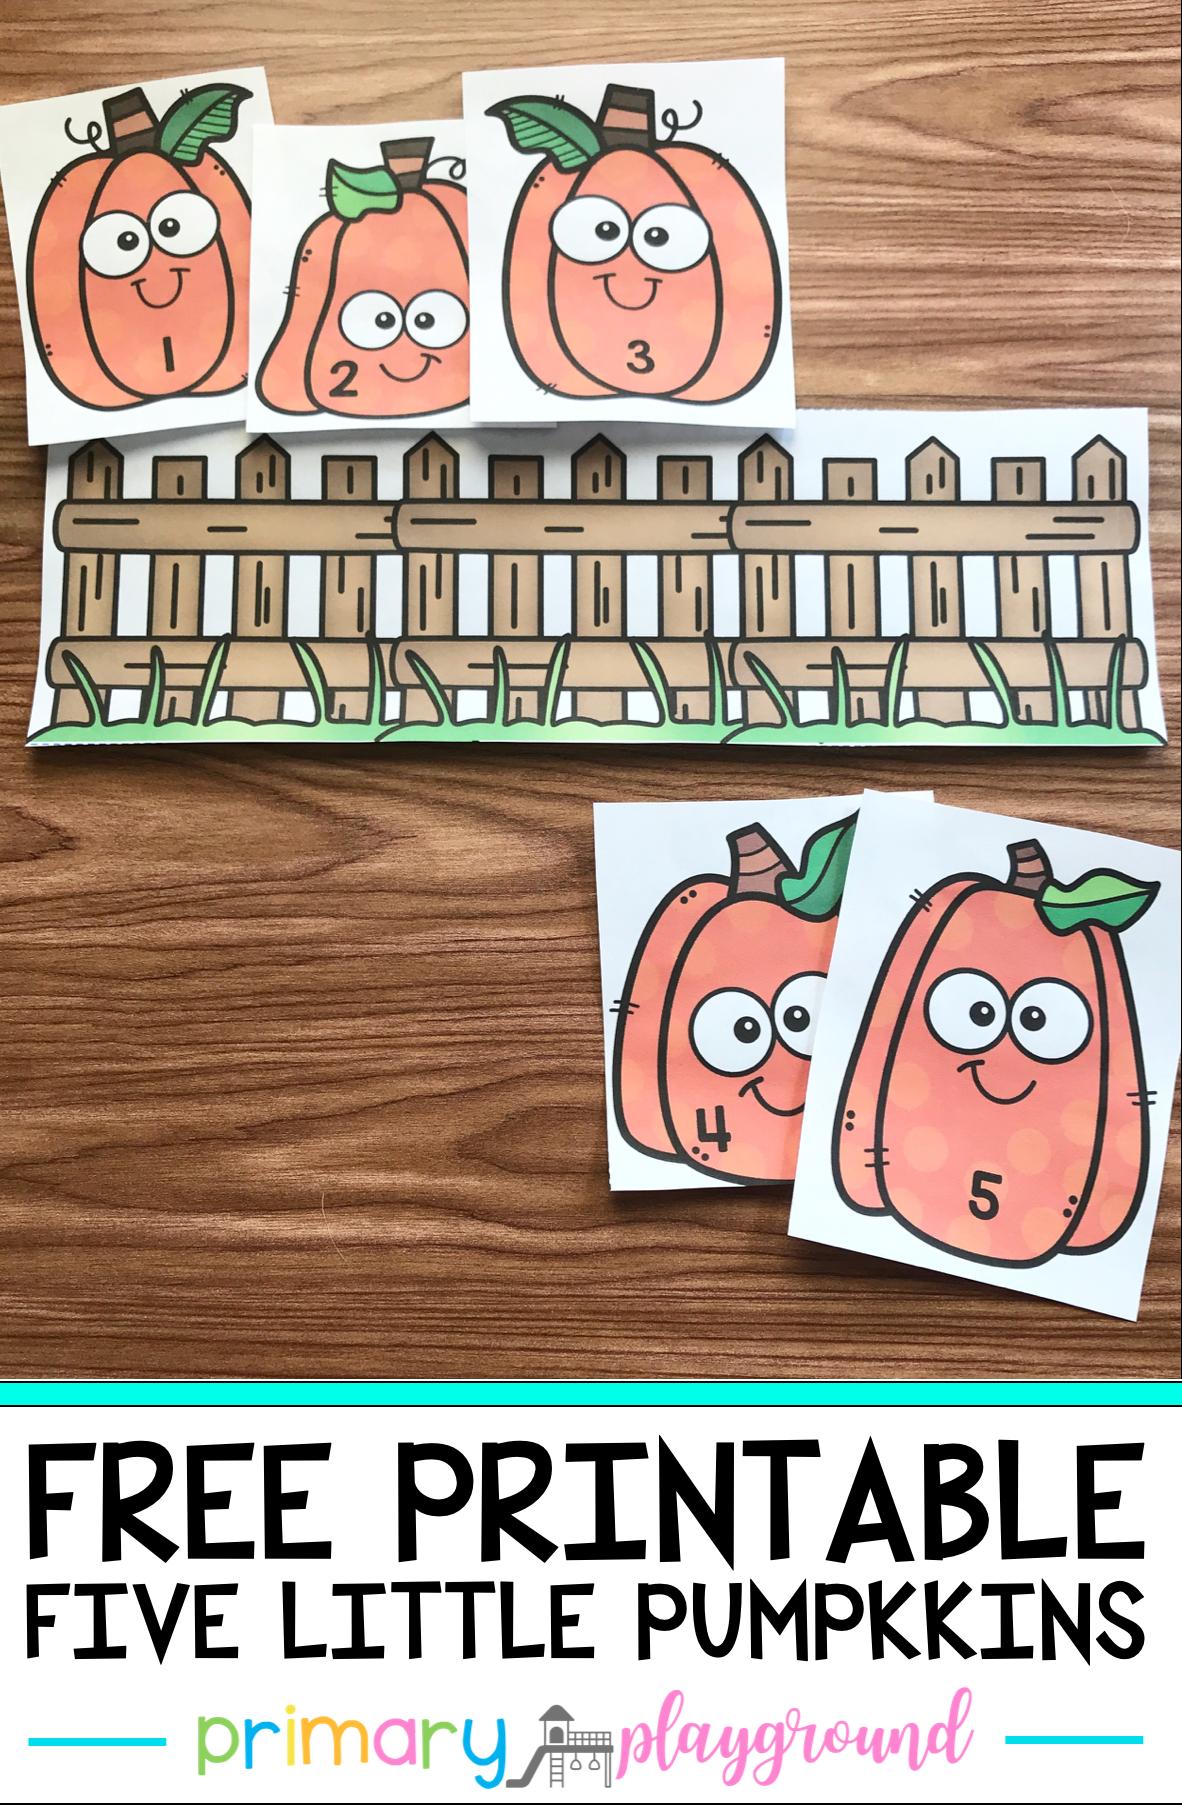 Free Printable Five Little Pumpkins